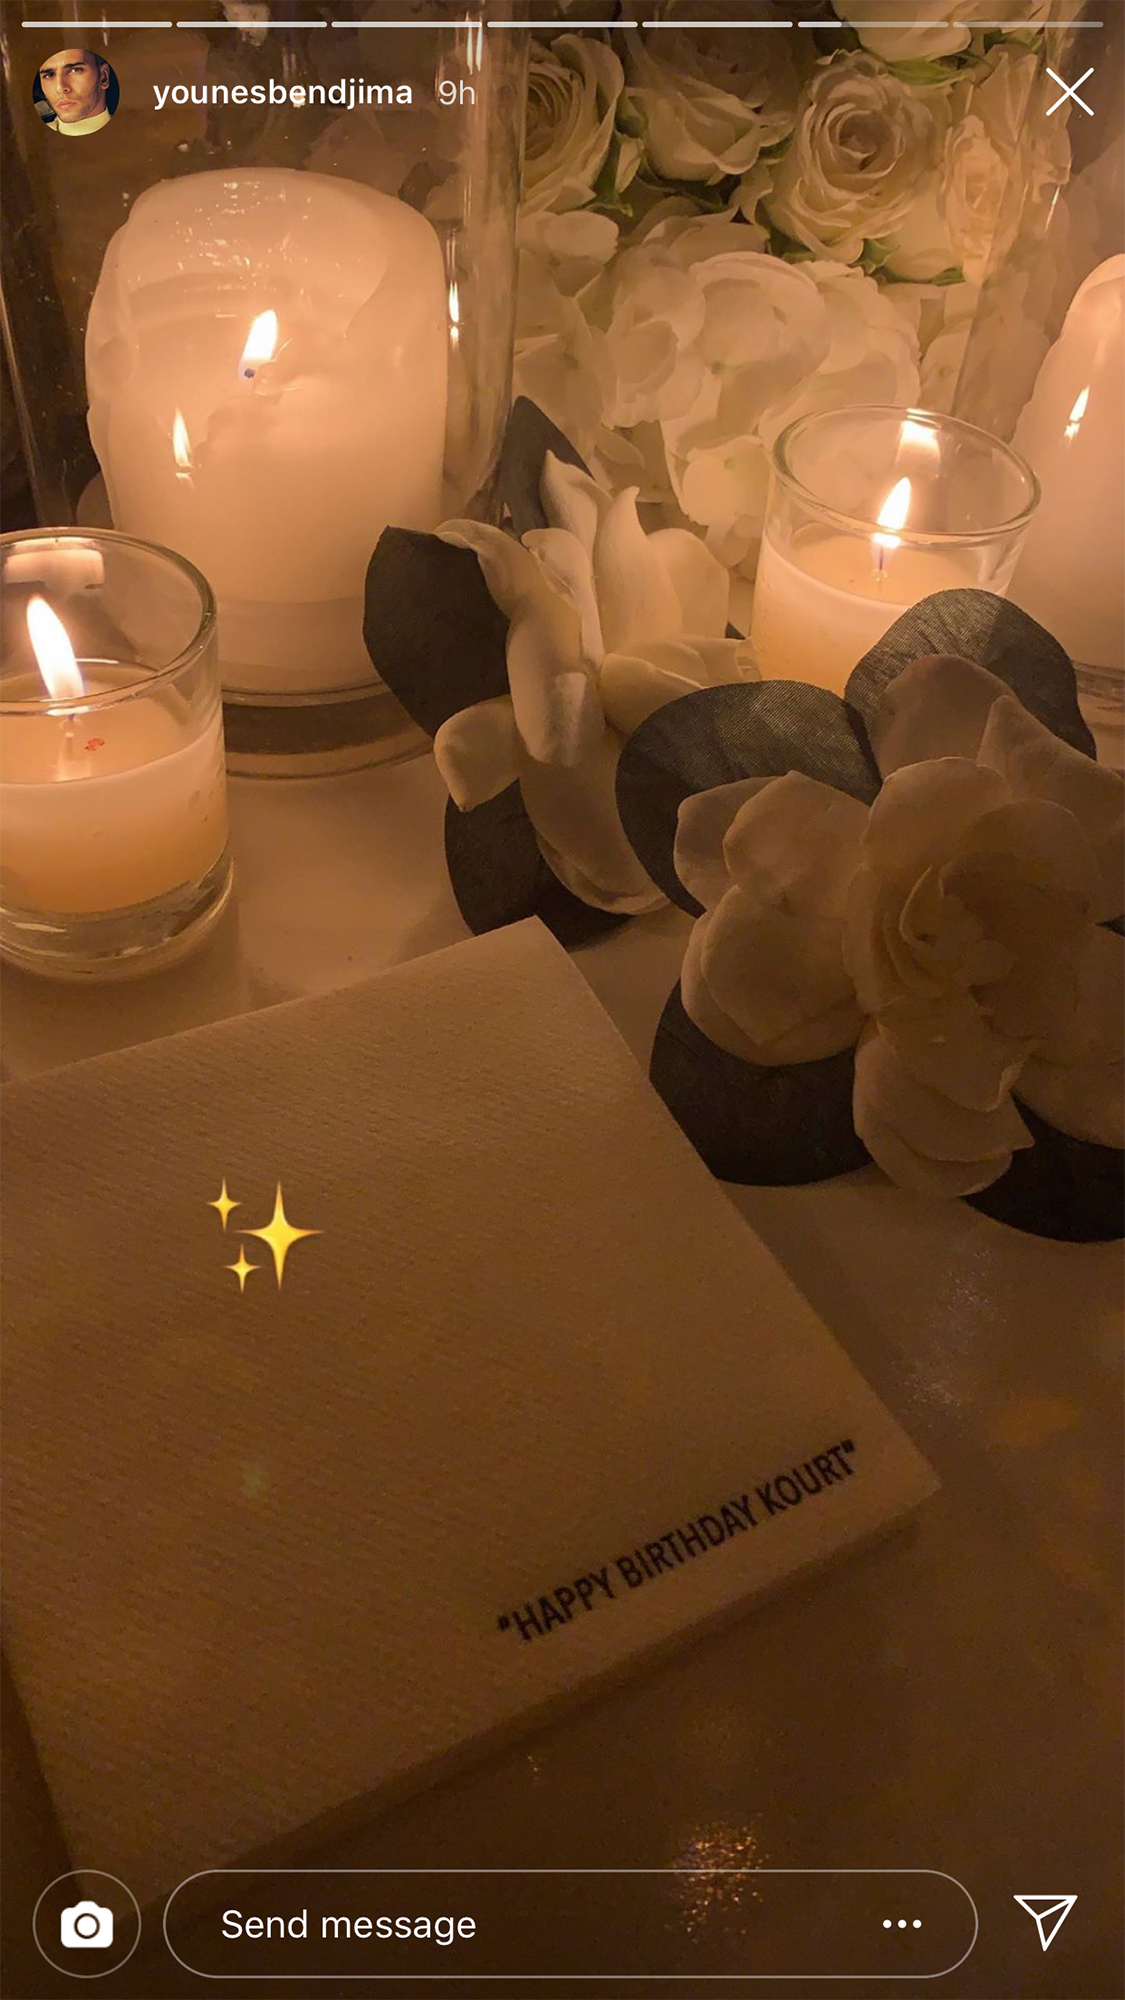 Kourtney Kardashian Birthday Party - Bendjima shared several videos from inside the party via his Instagram Story.